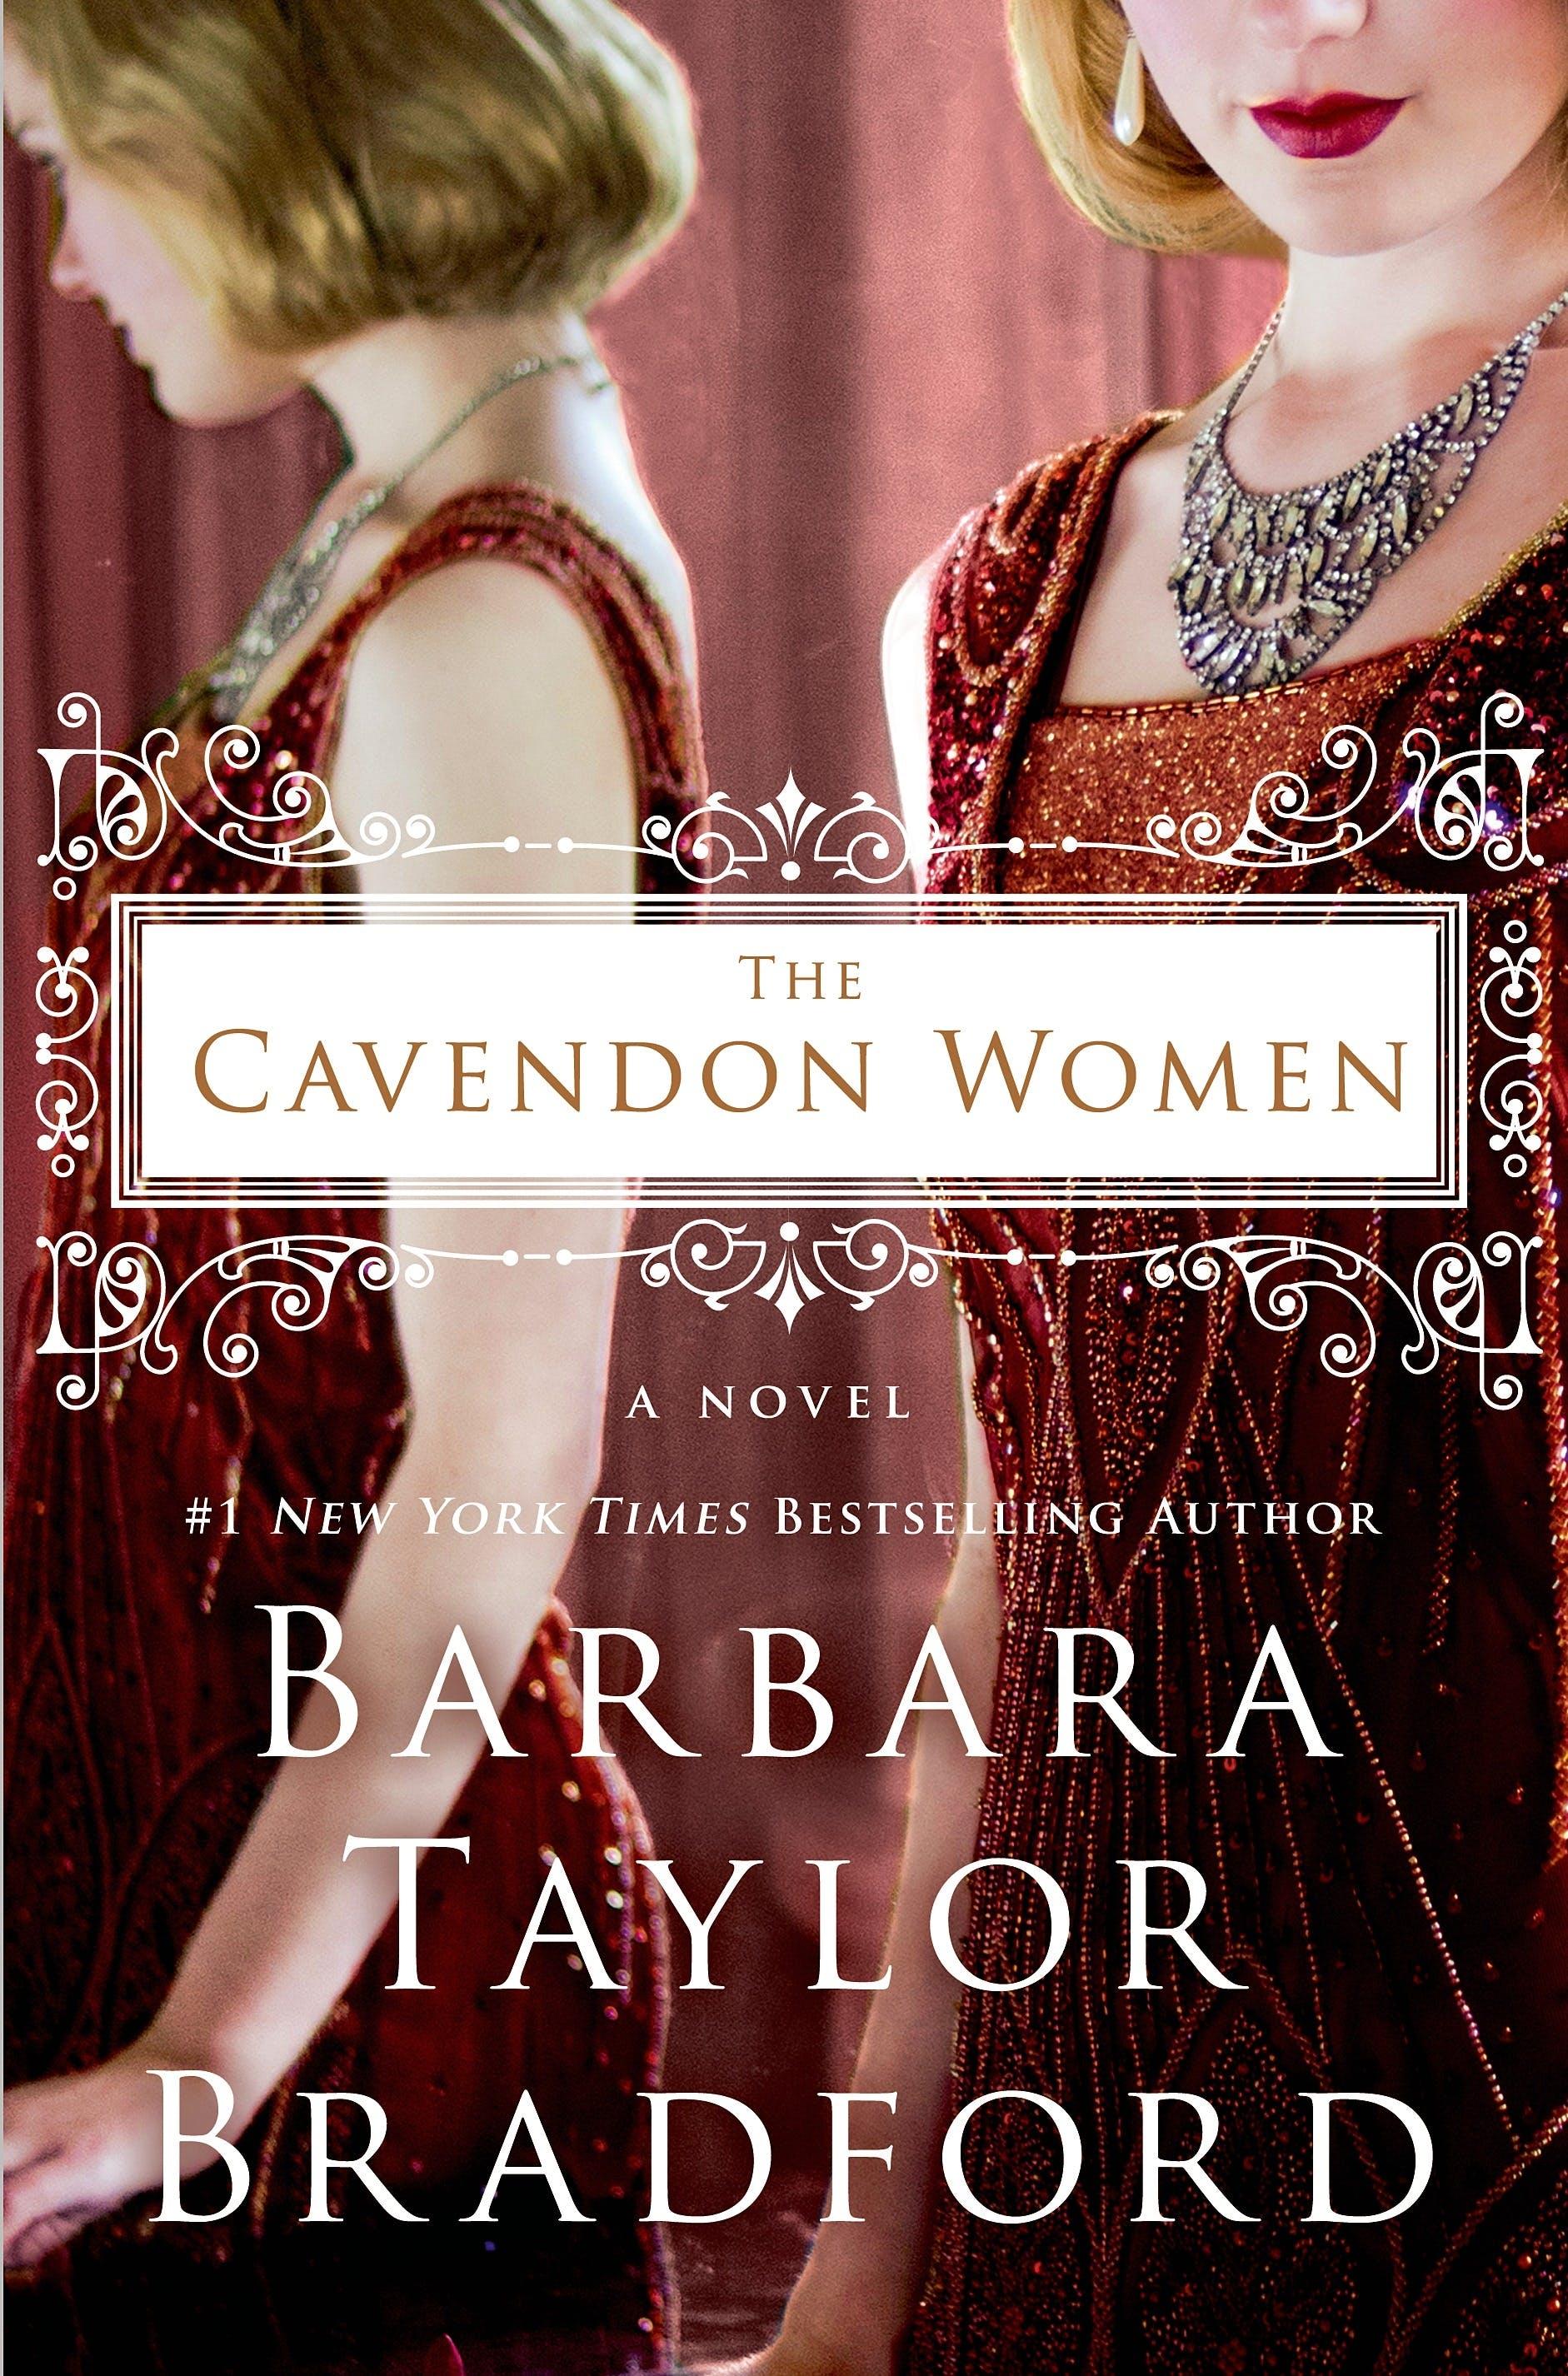 Image of The Cavendon Women